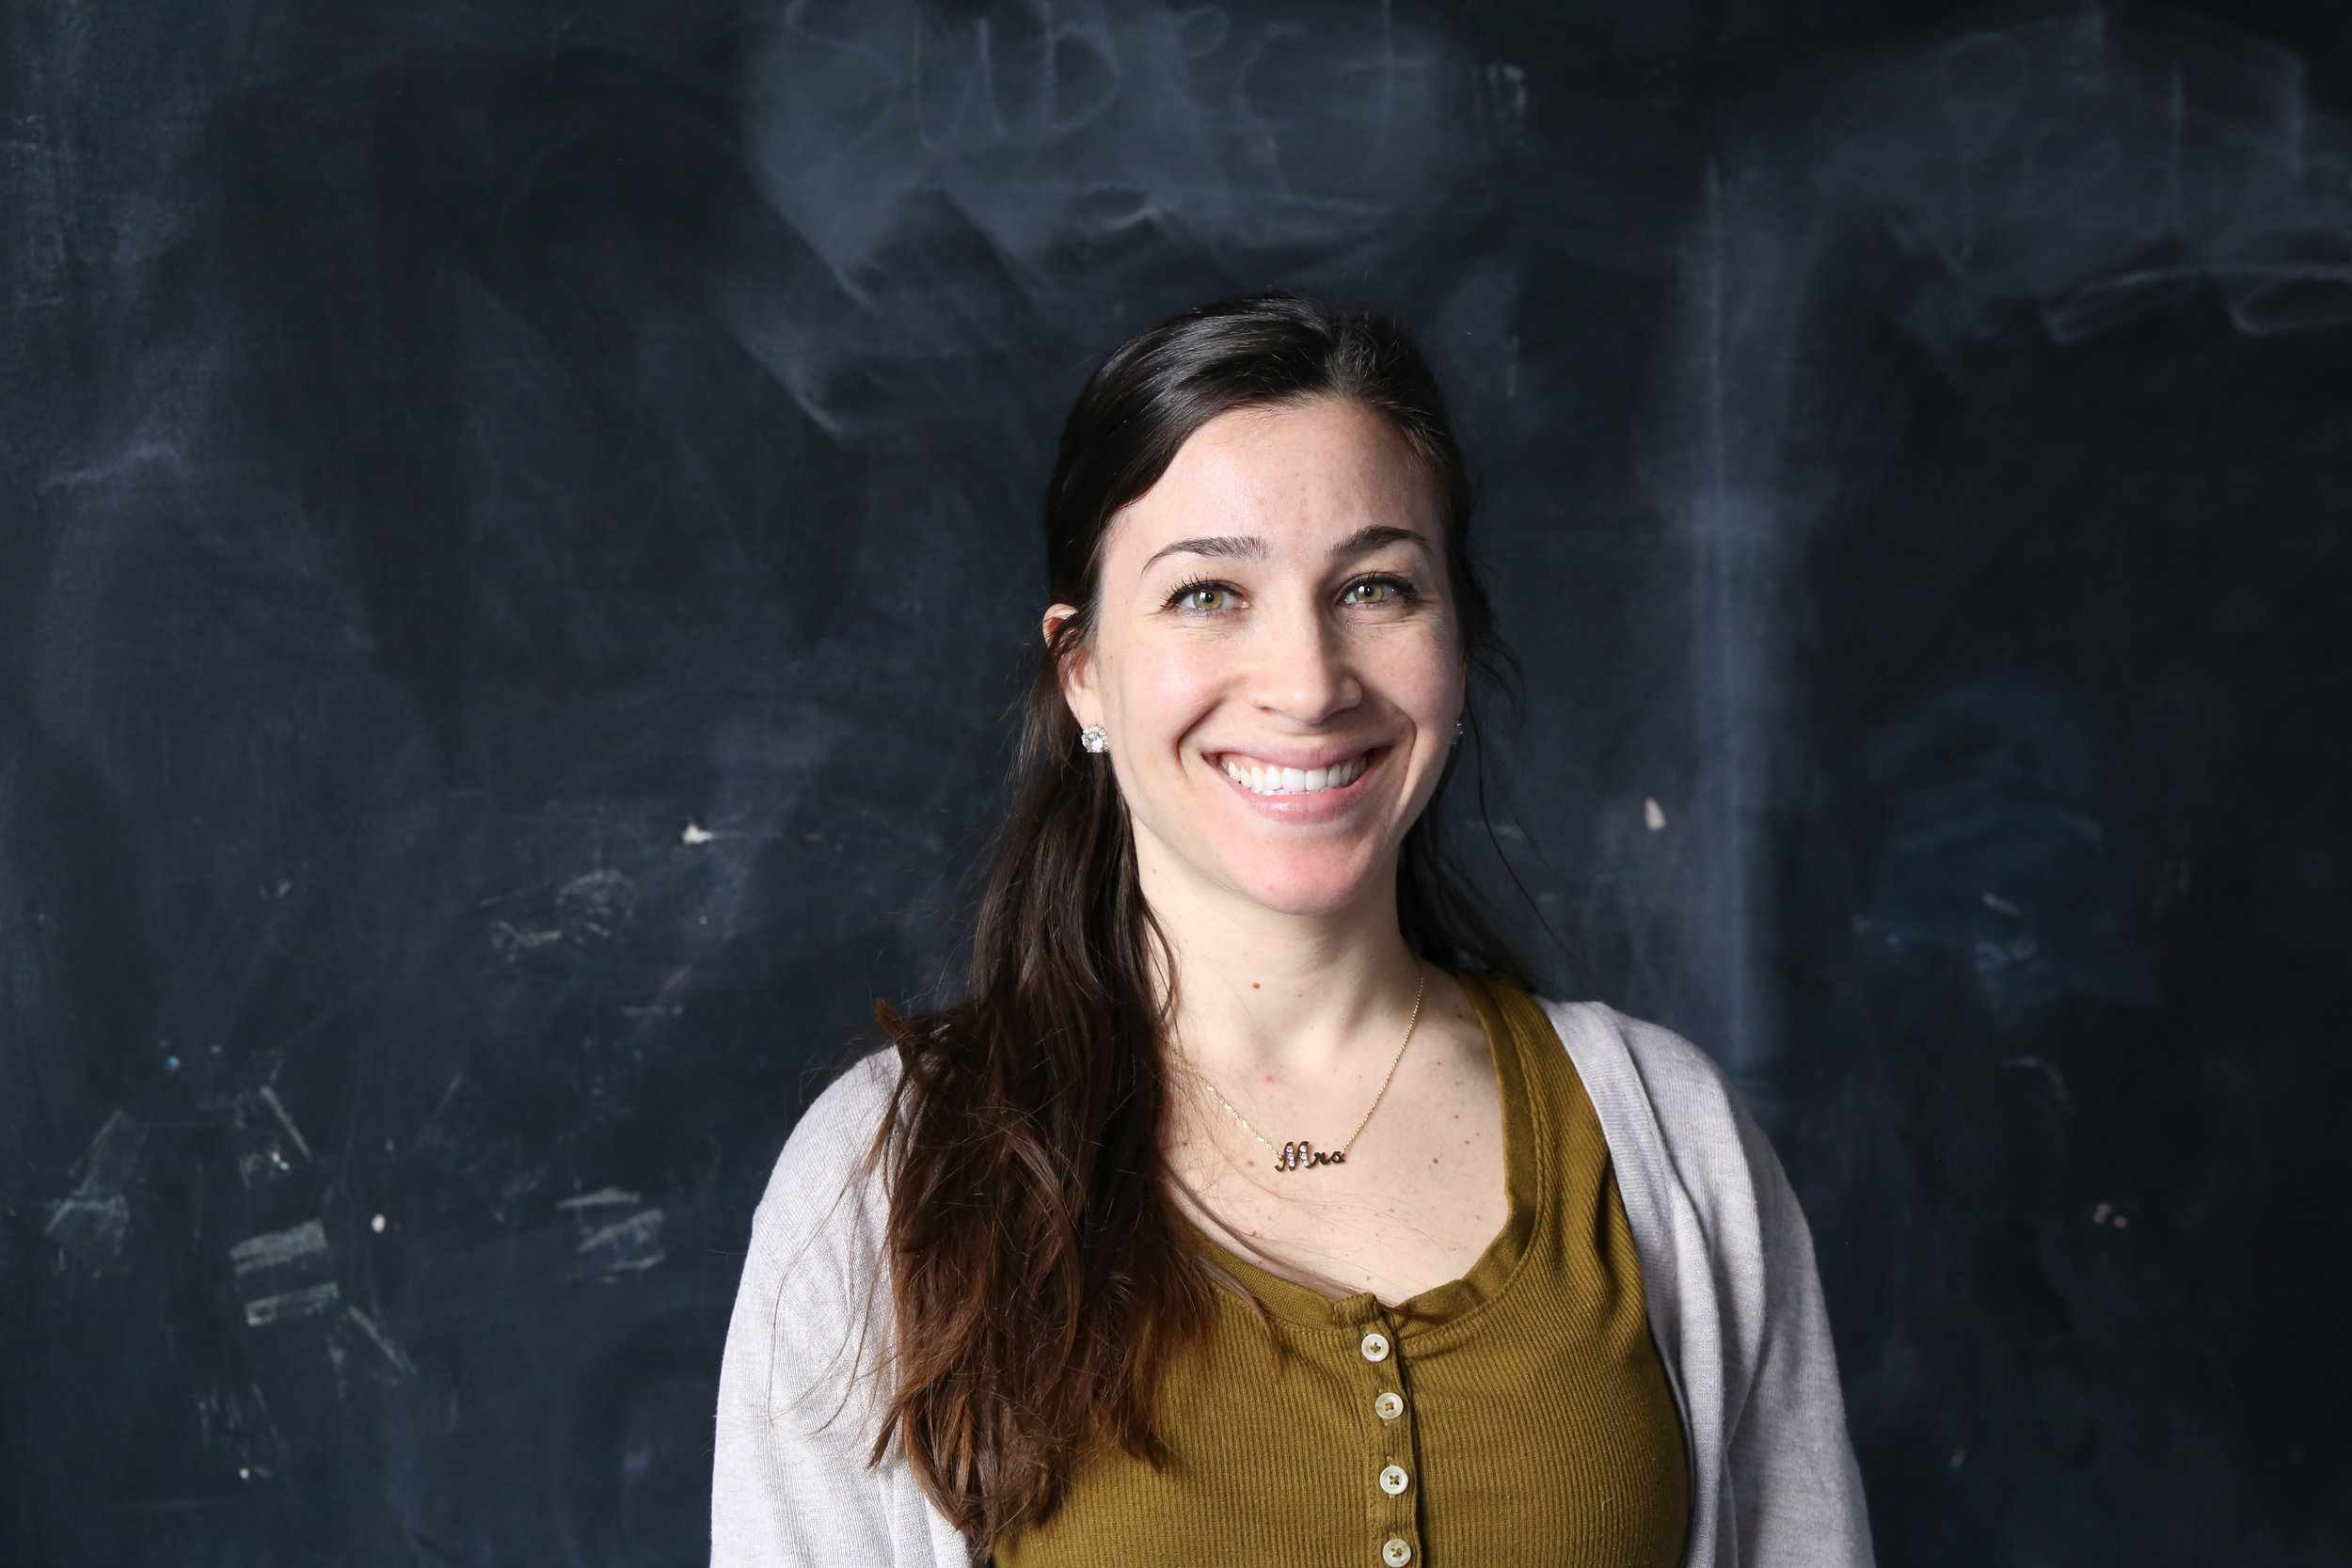 Brittney O'Rourke, MS, MS (ABA) - Senior Behaviorist